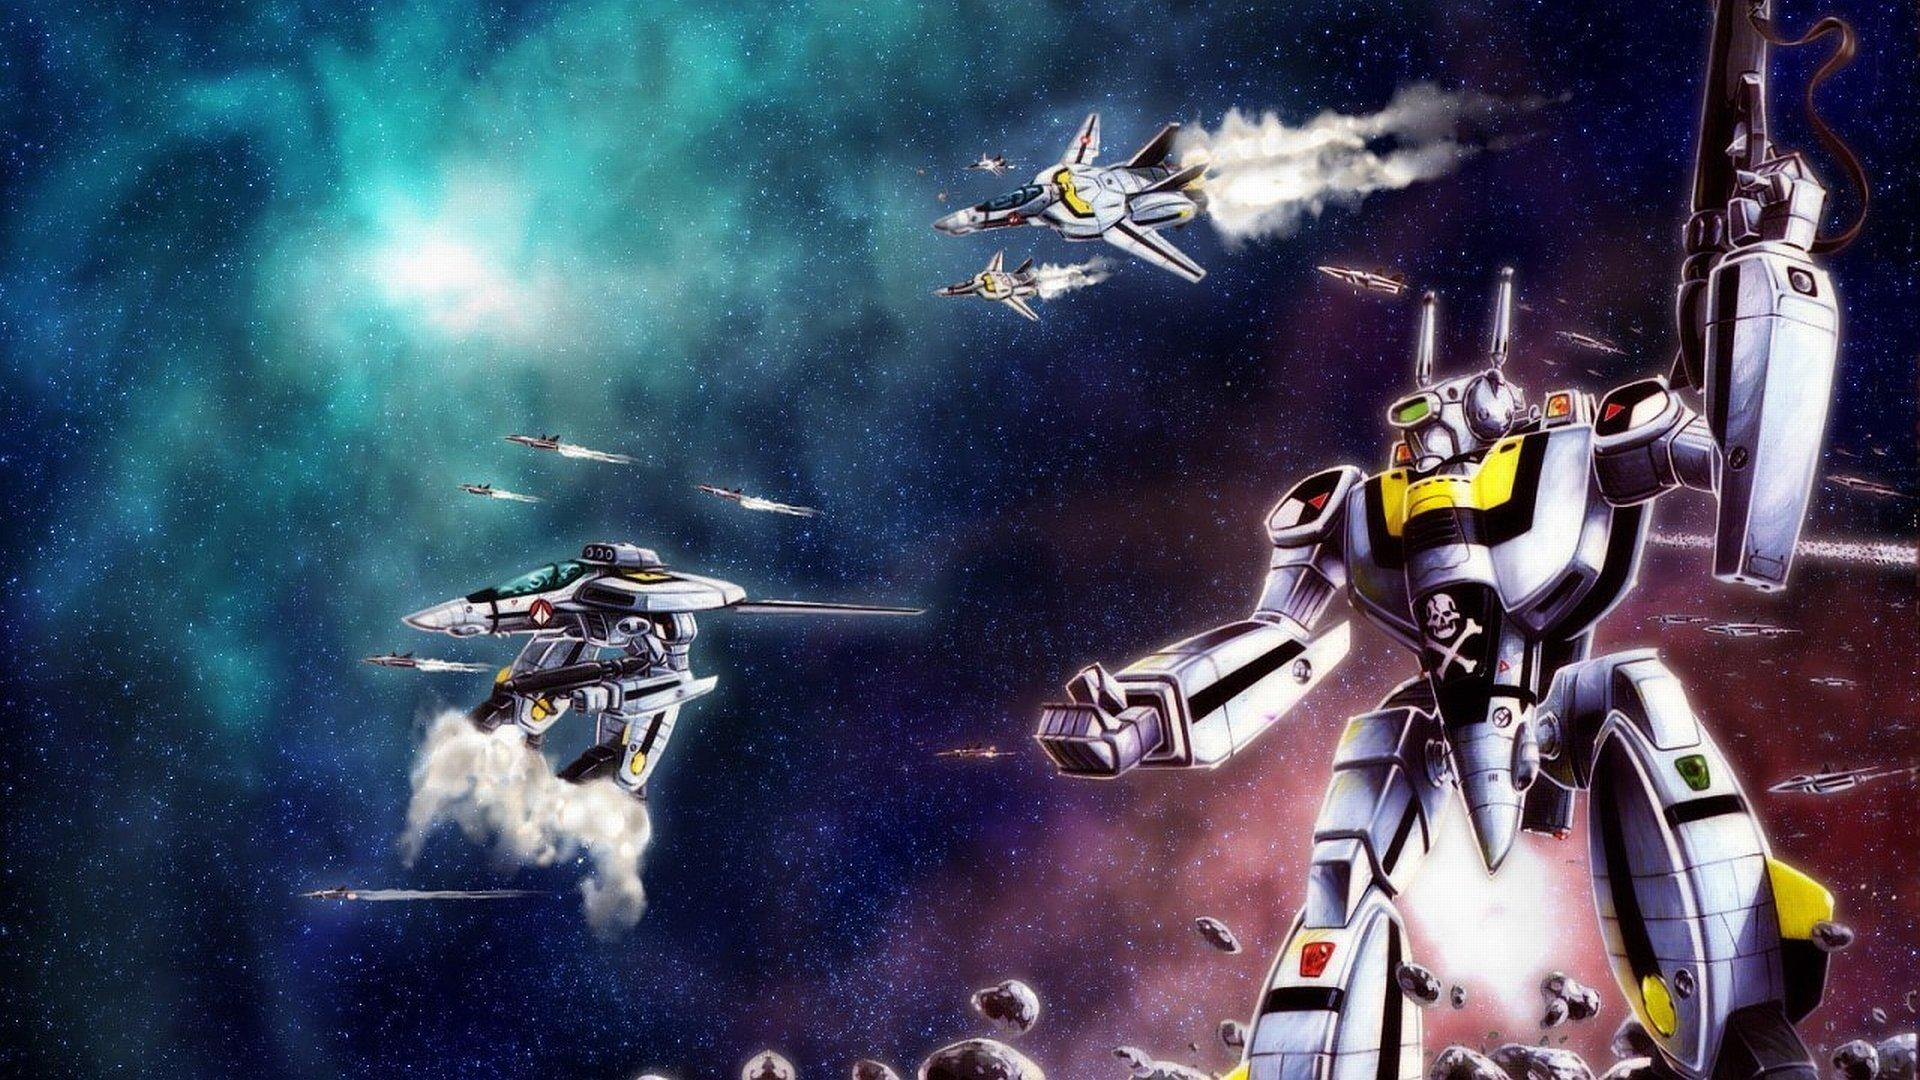 Robotech hd wallpaper background image 1920x1080 id - Robotech 1080p ...